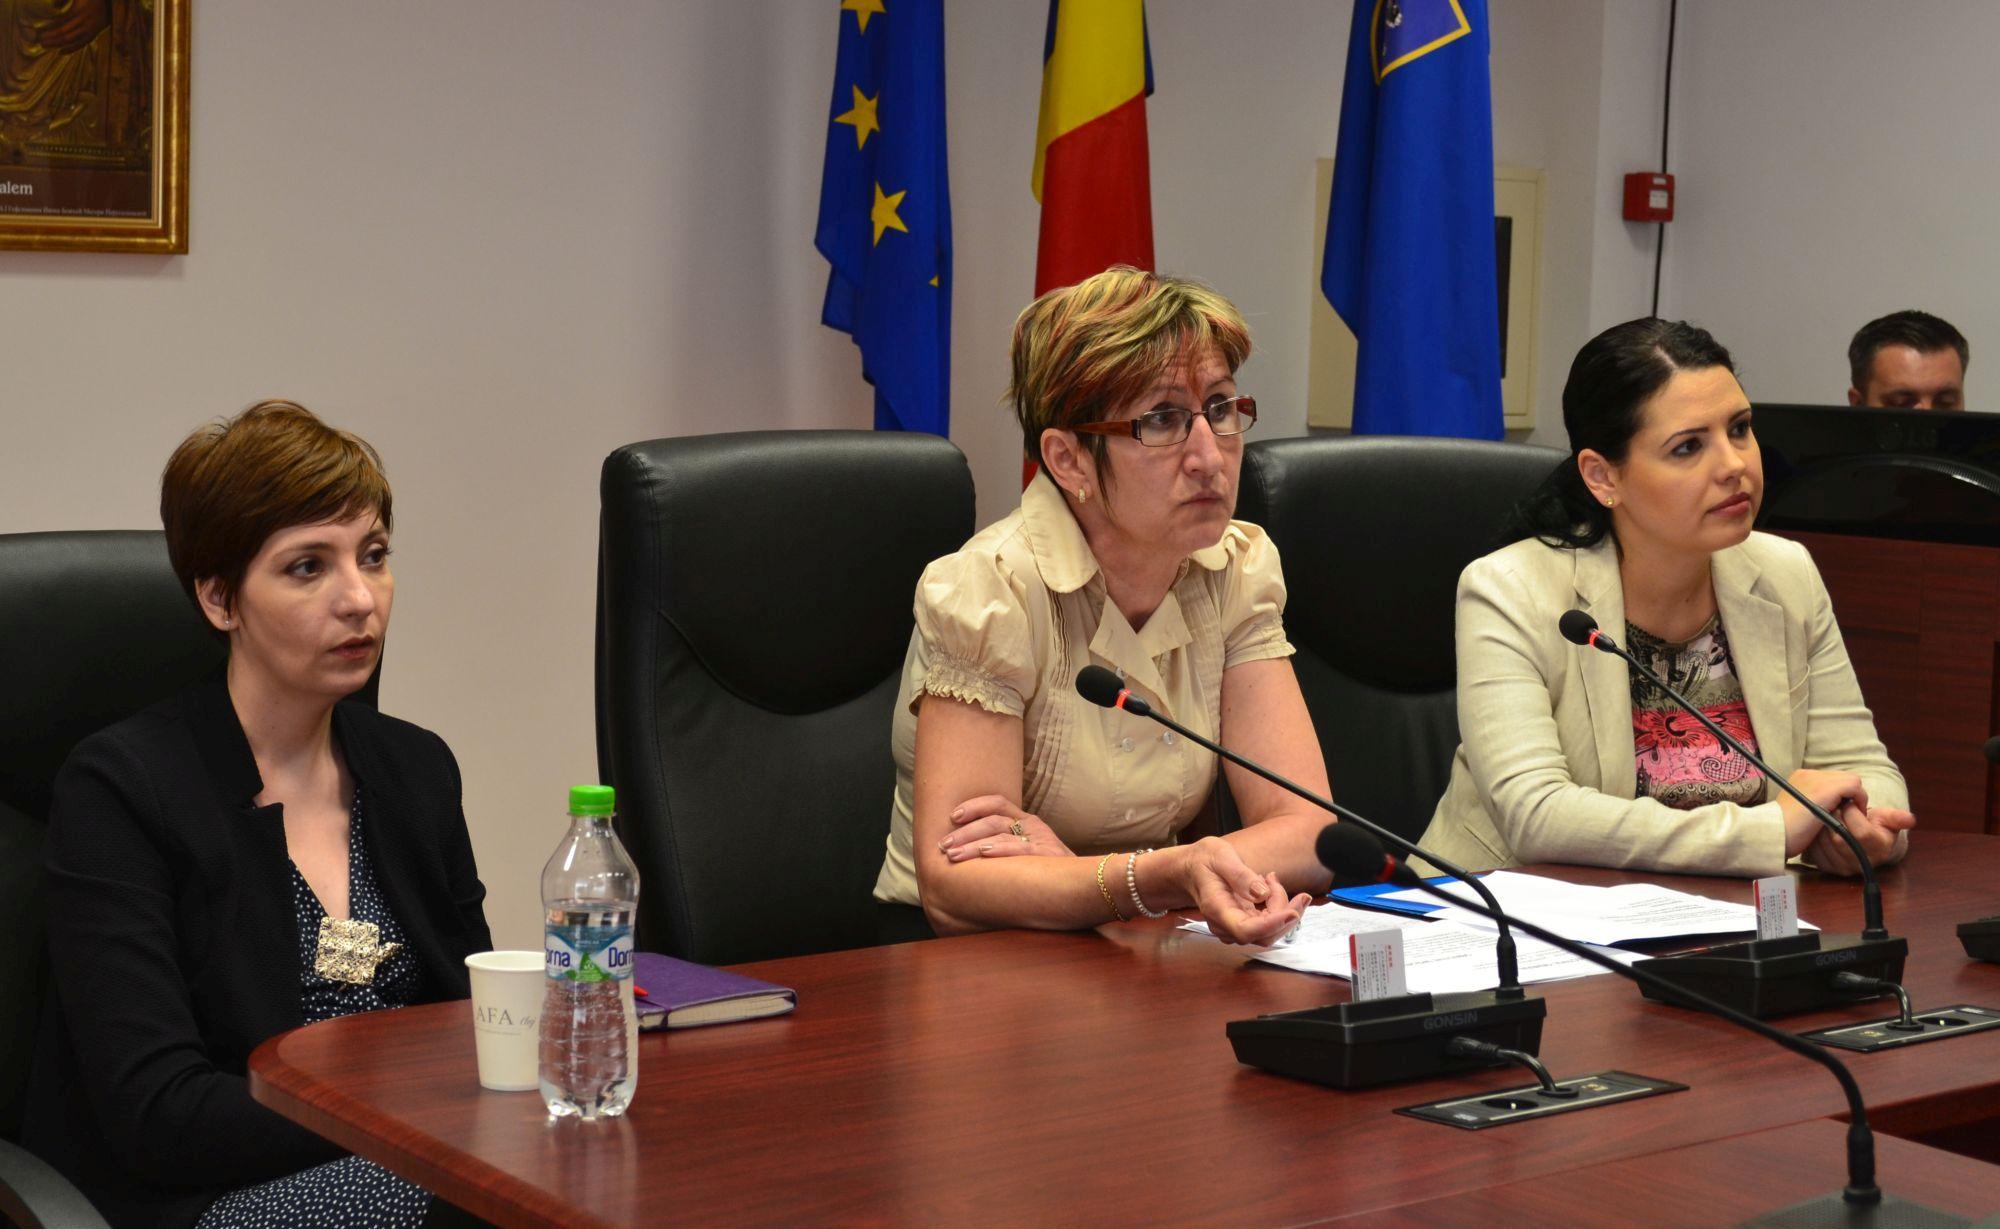 Amedeea Enache, Nicoleta Molnar, Diana Coman